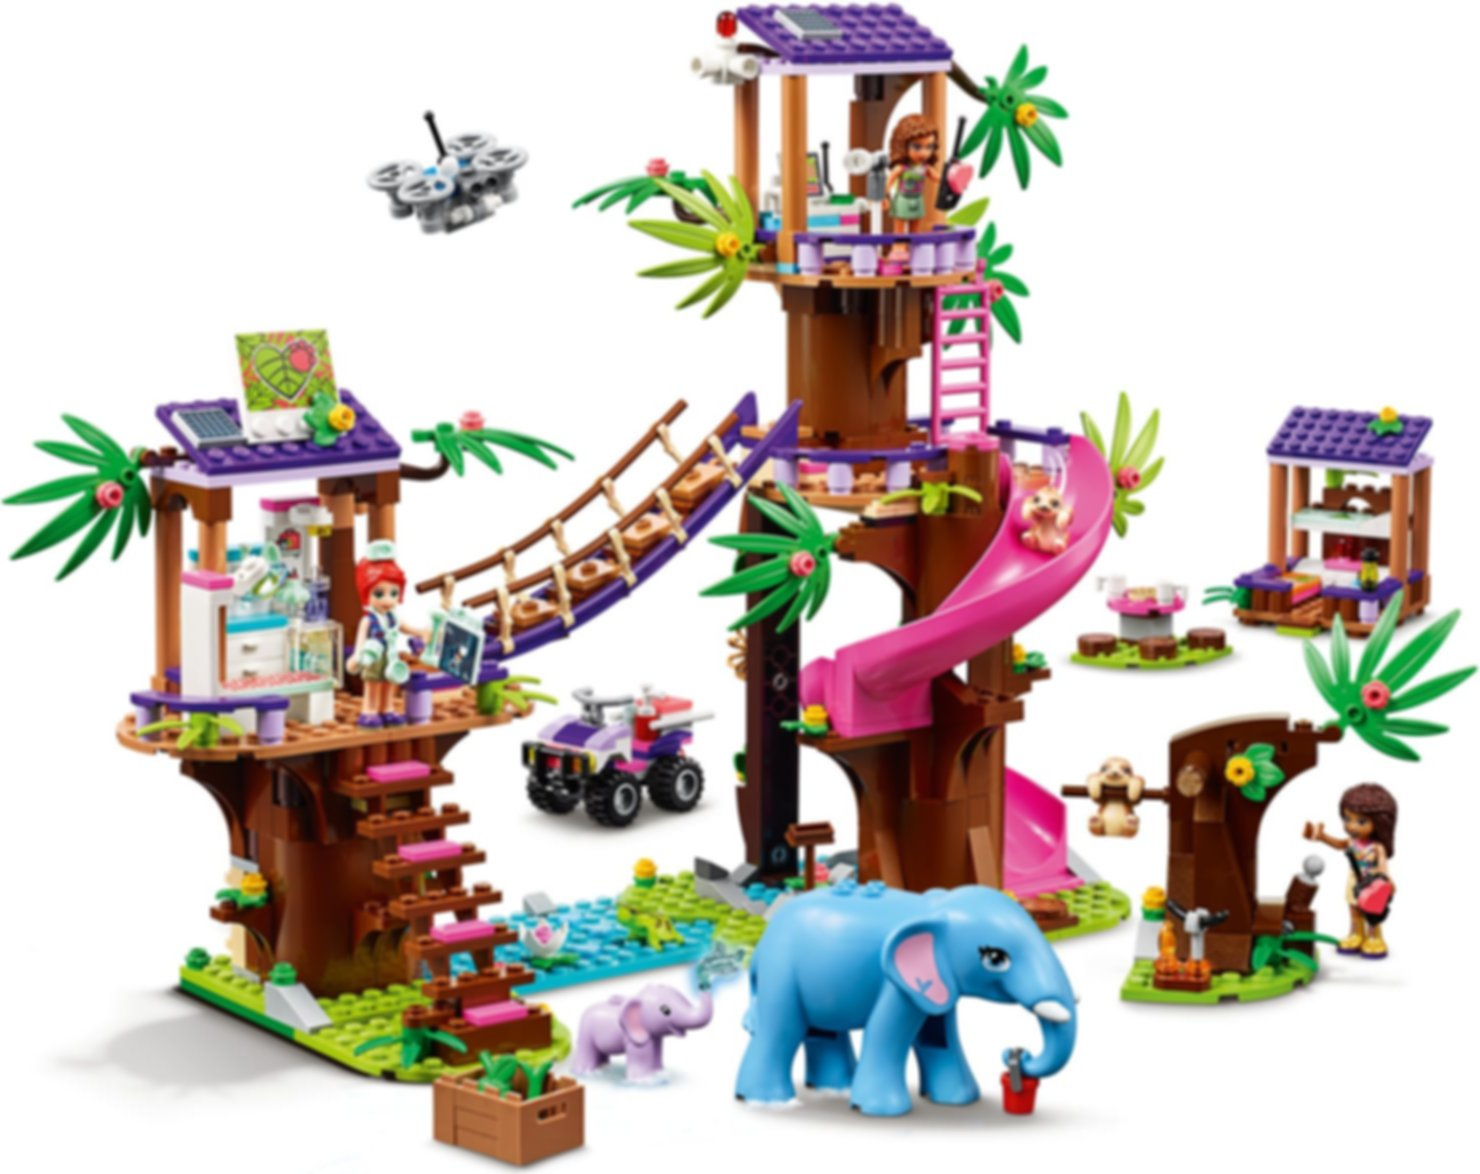 Jungle Rescue Base gameplay